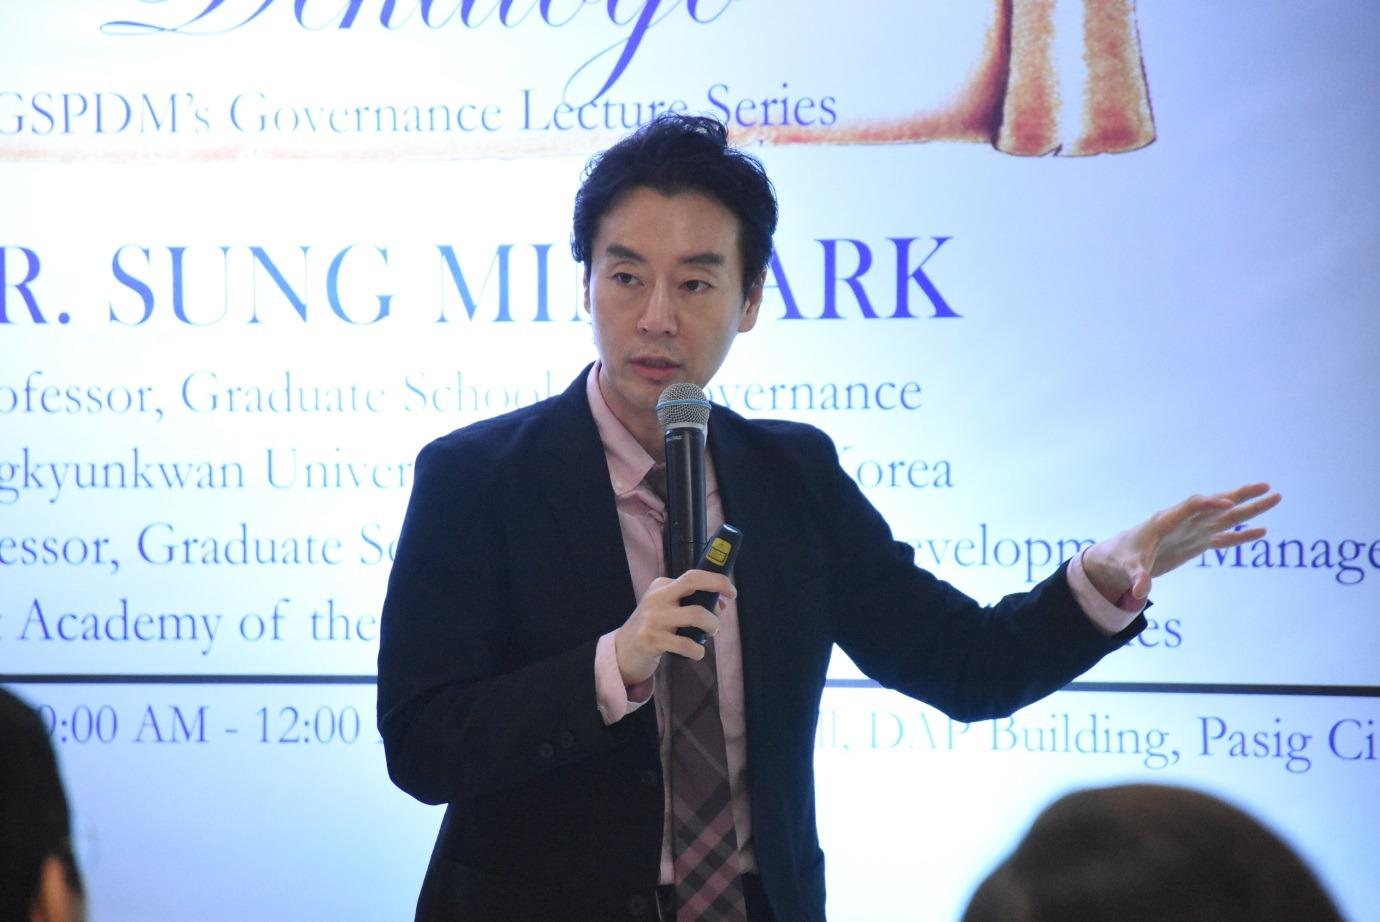 Dr. Sung Min Park